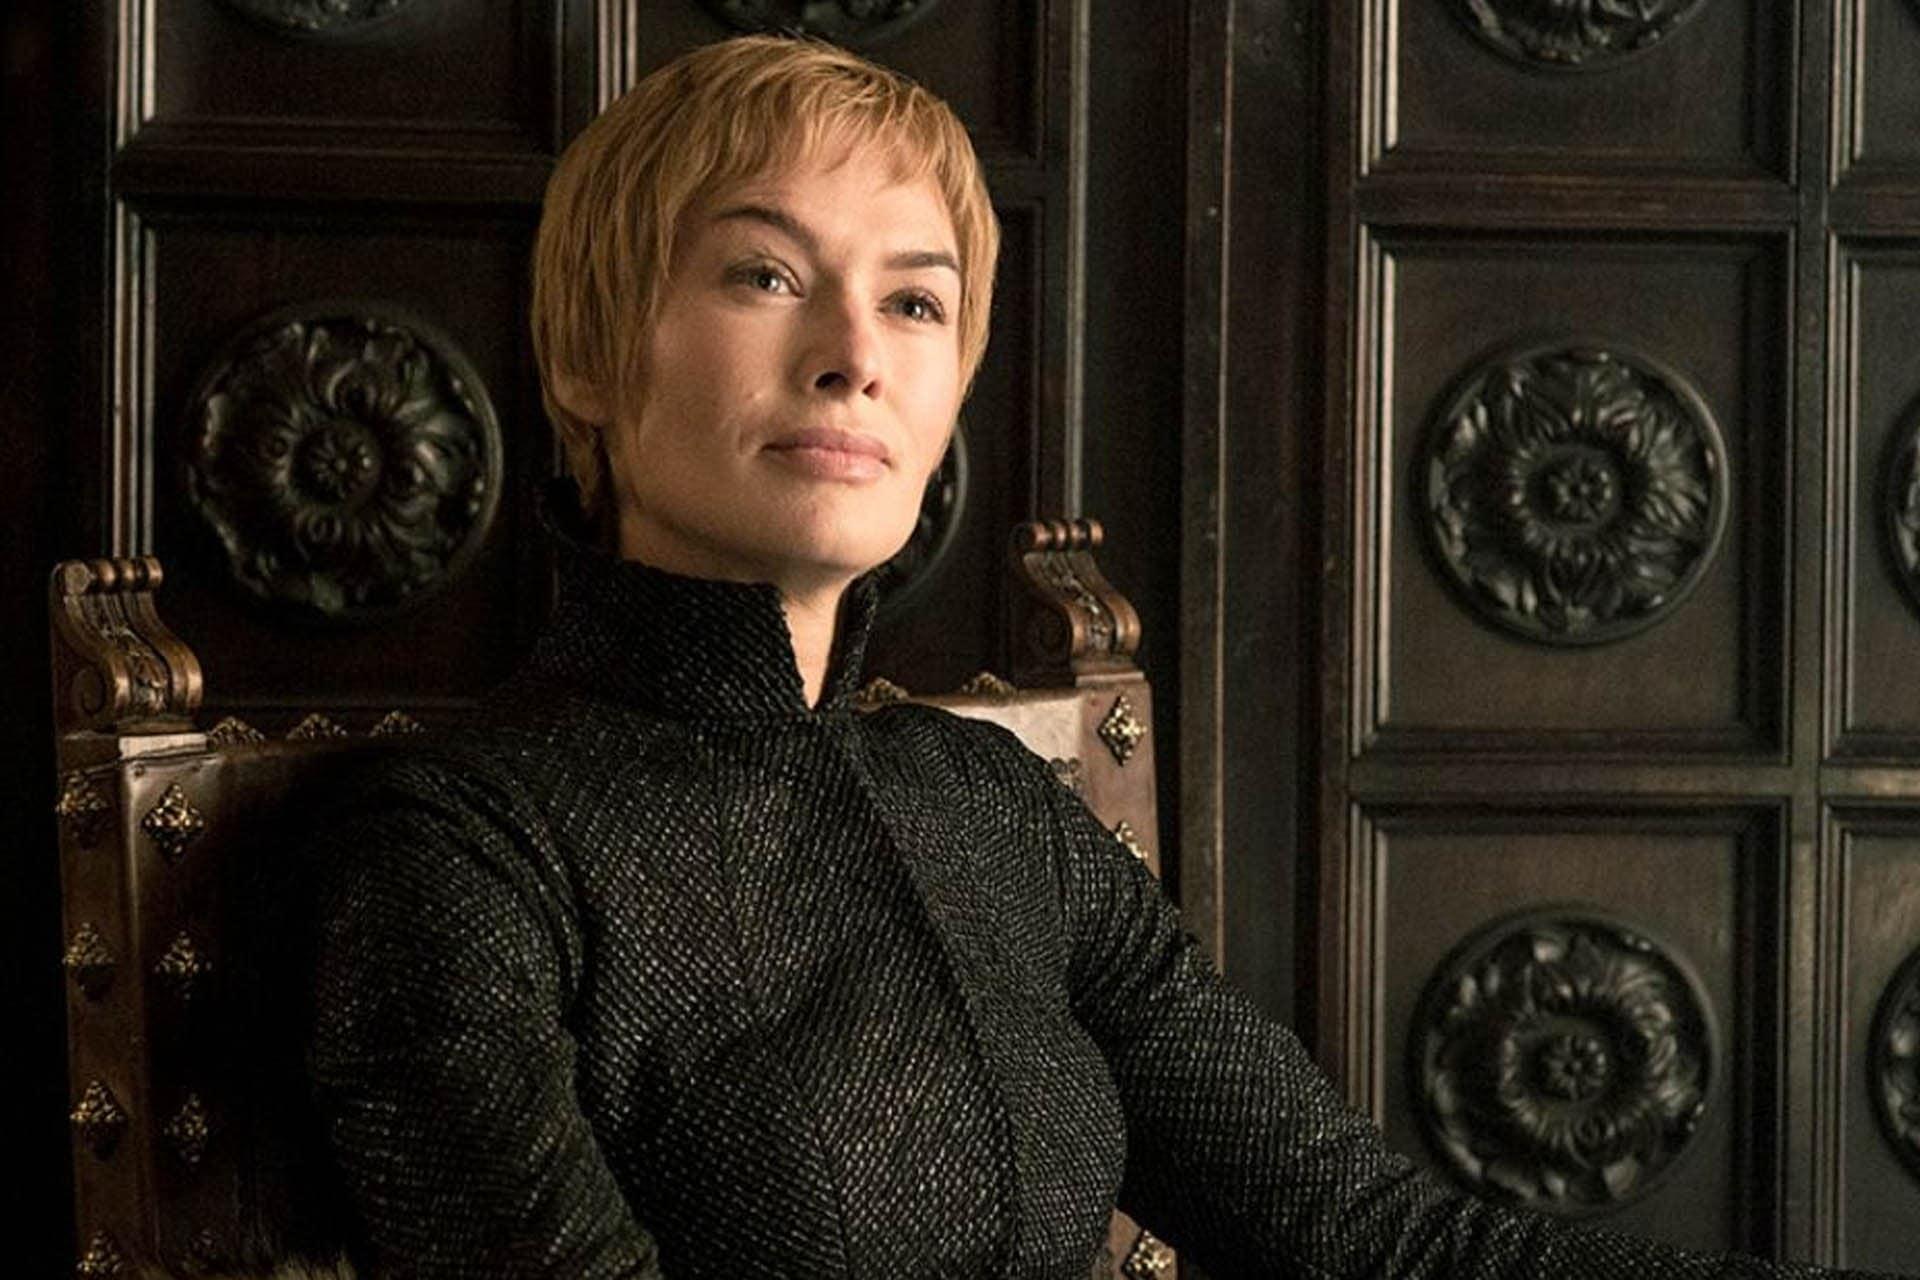 Lena Headey Earned $69,000 A Minute Playing Cersei The Evil Queen In GoT Season 8